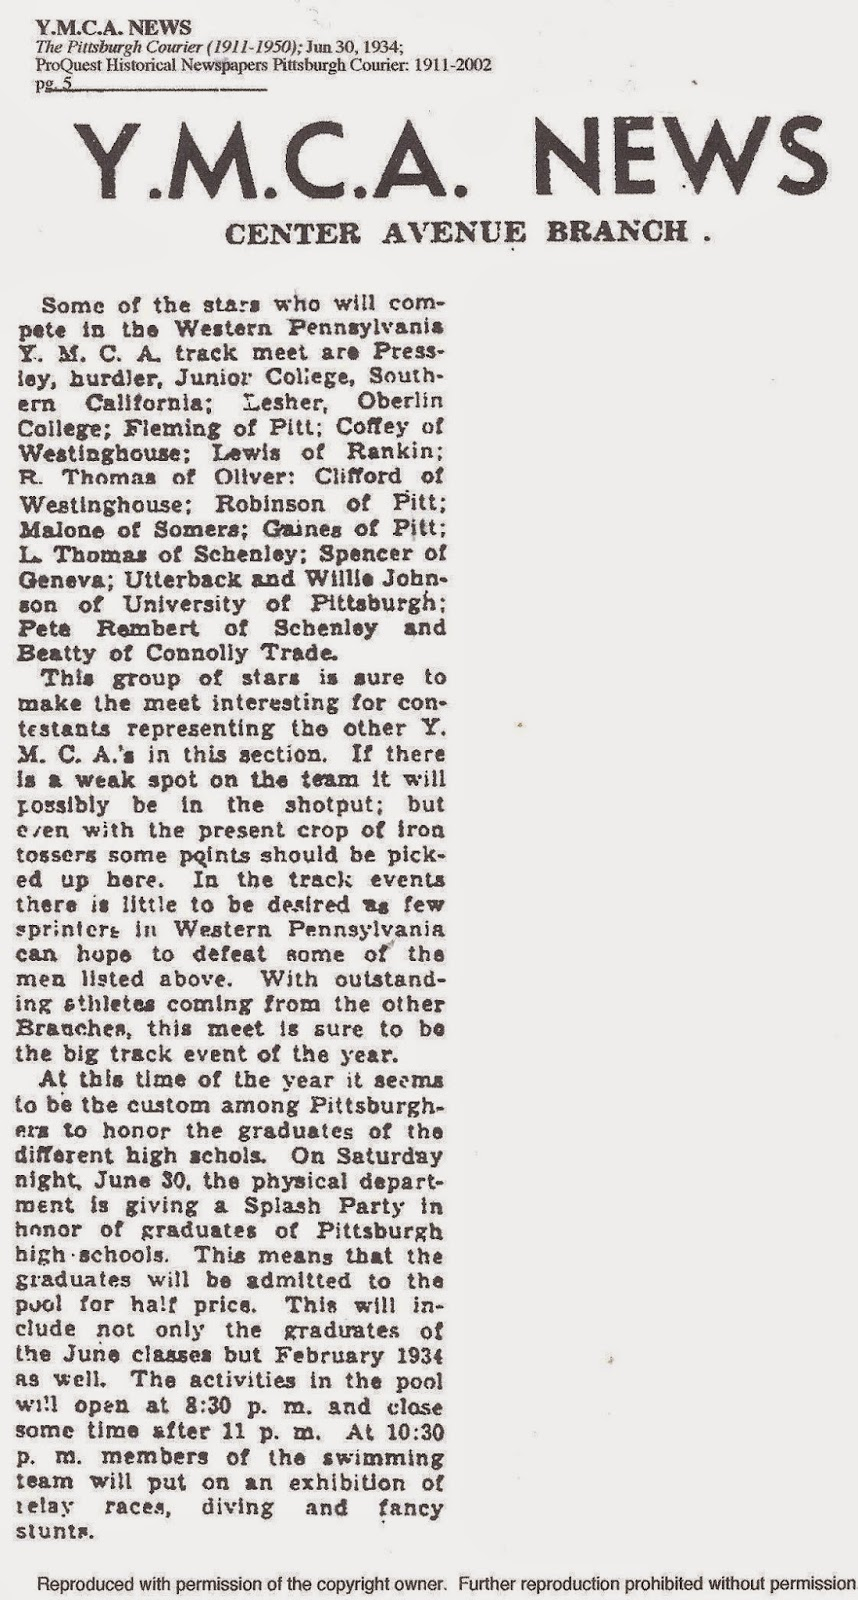 Black Buzz: YMCA News Center Avenue Branch, June 30, 1934